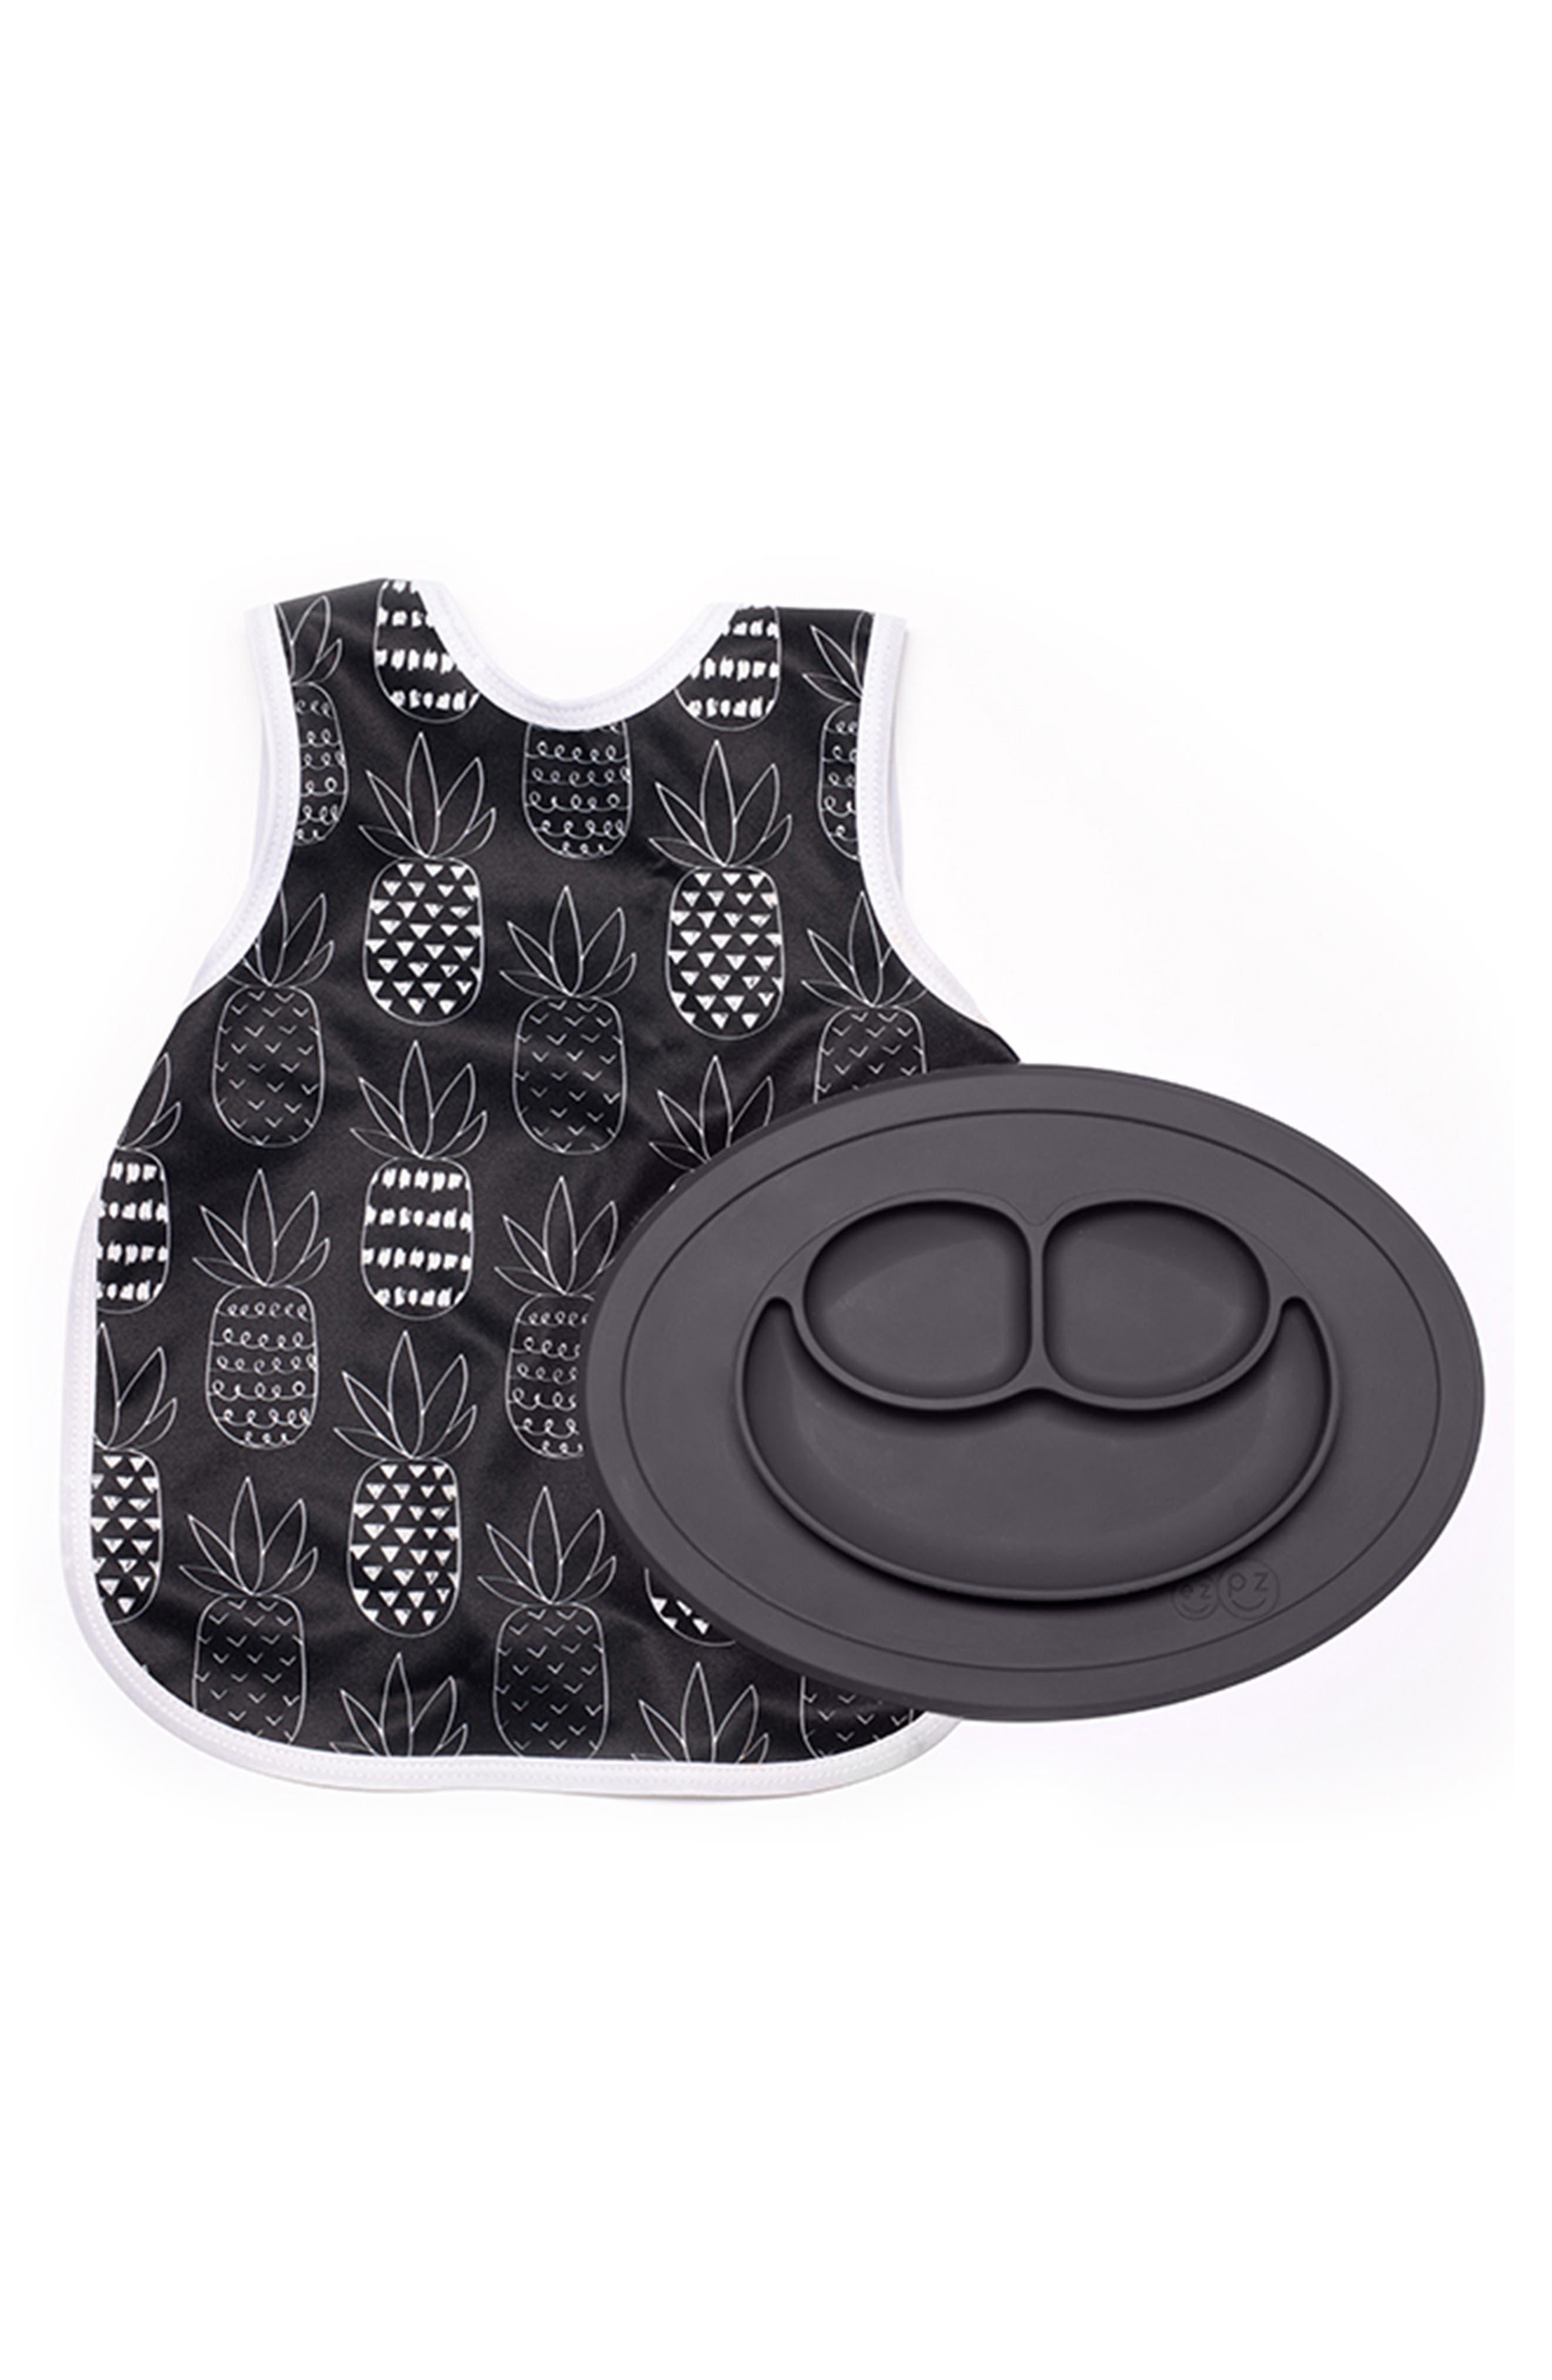 EZPZ Monochrome Bapron & Mini Silicone Feeding Mat, Main, color, BLACK/ WHITE